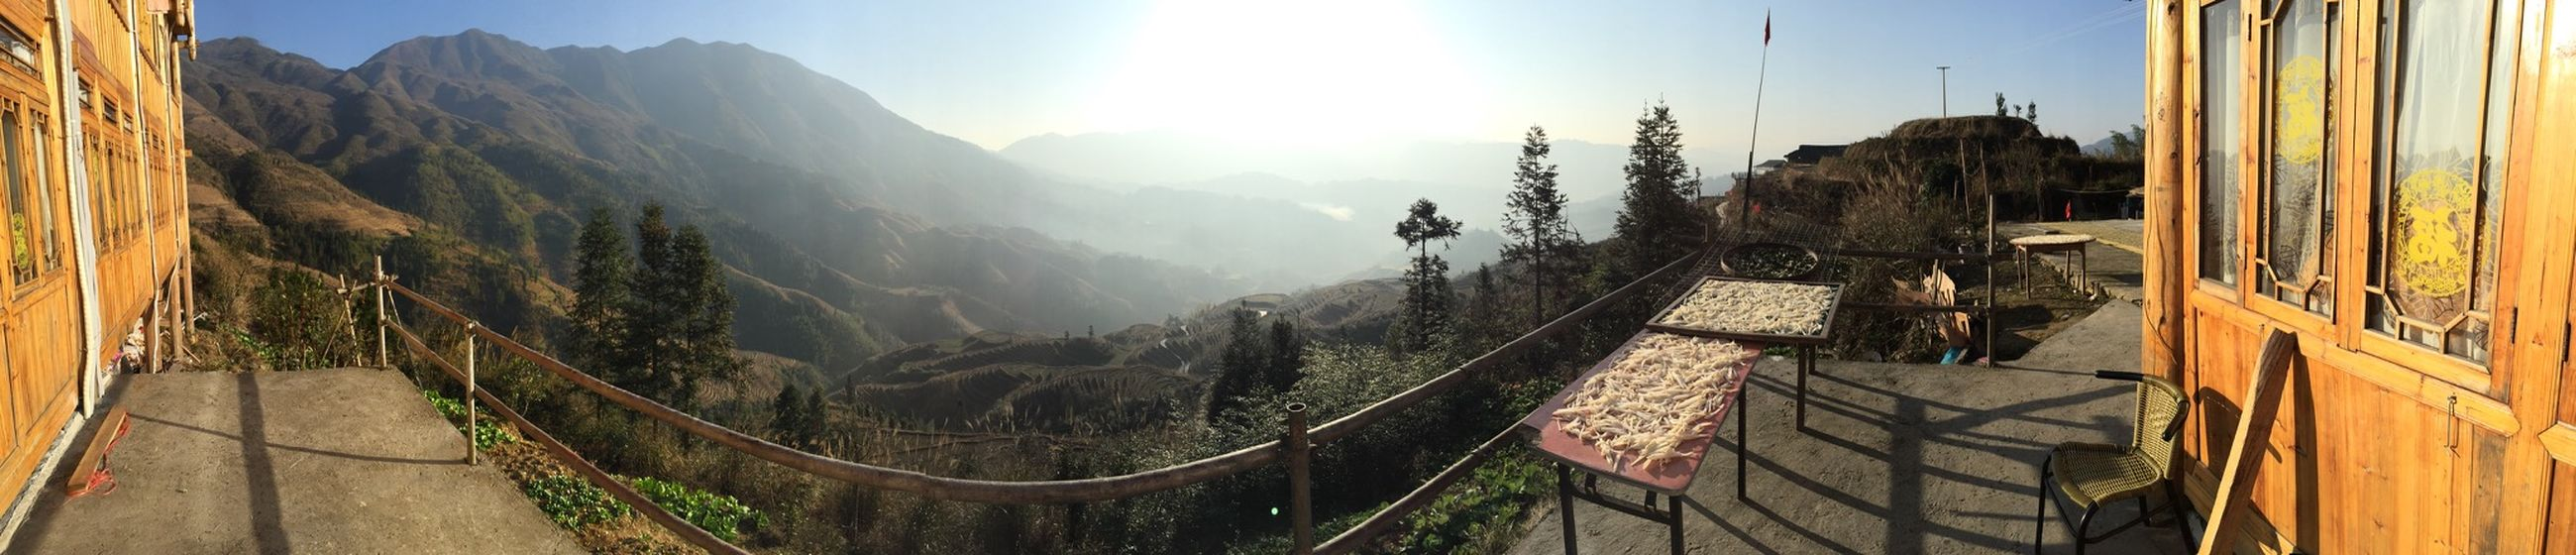 Check This Out Life Journey China China 龙脊梯田